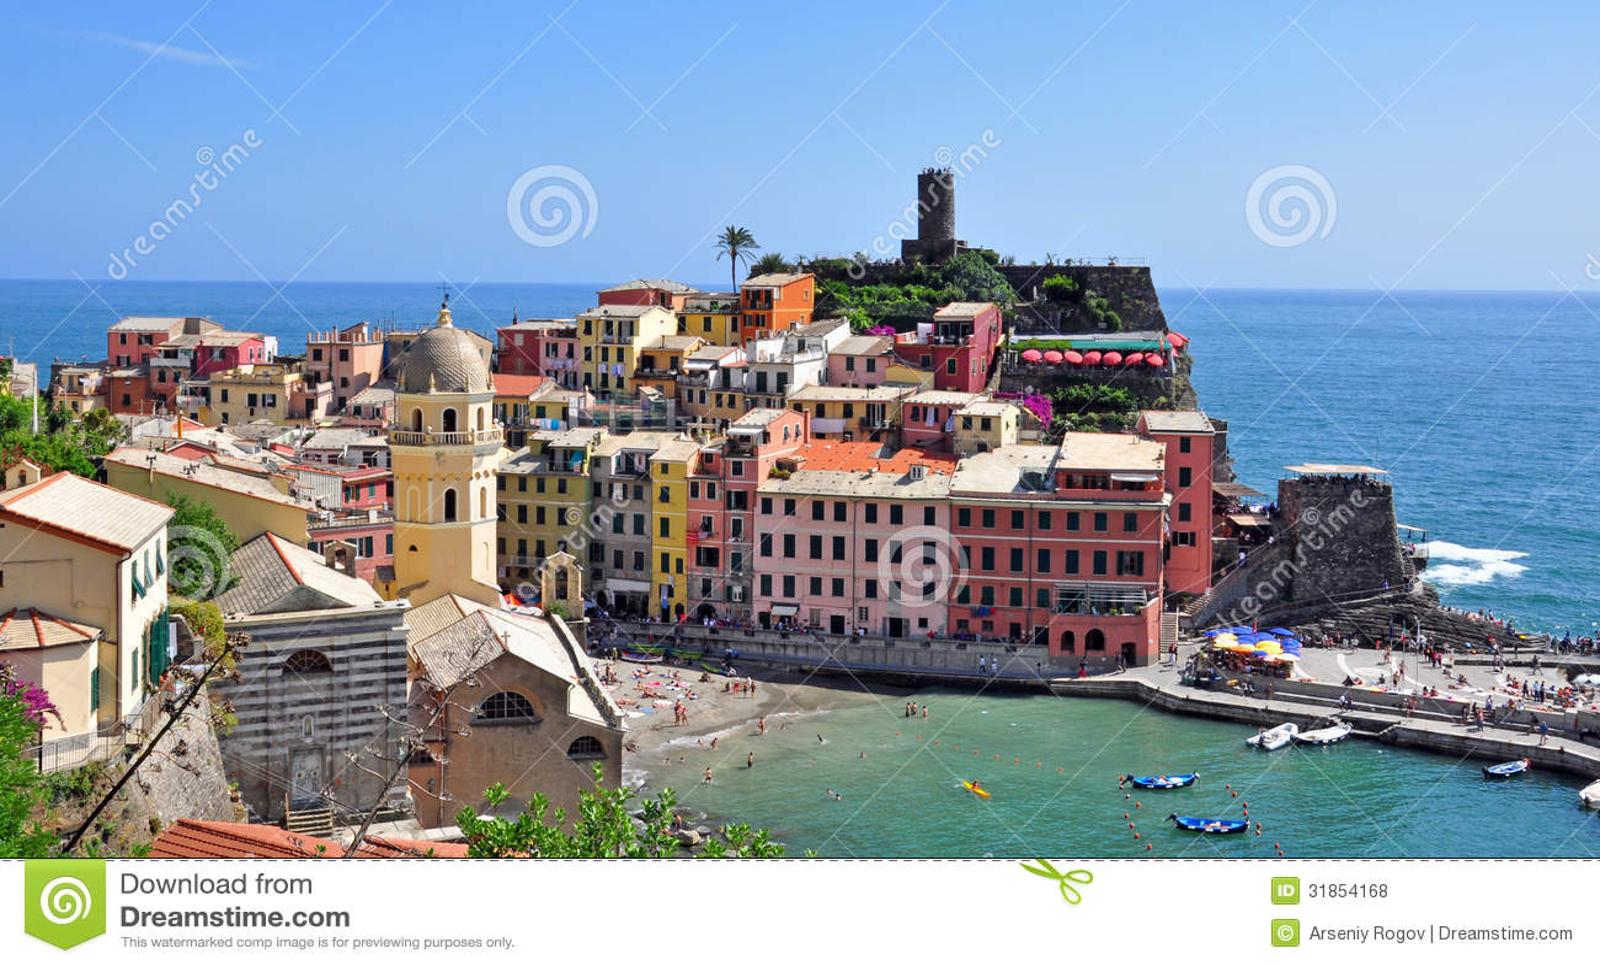 Italian House Plans Italian Mediterranean Landscape Royalty Free Stock Photos